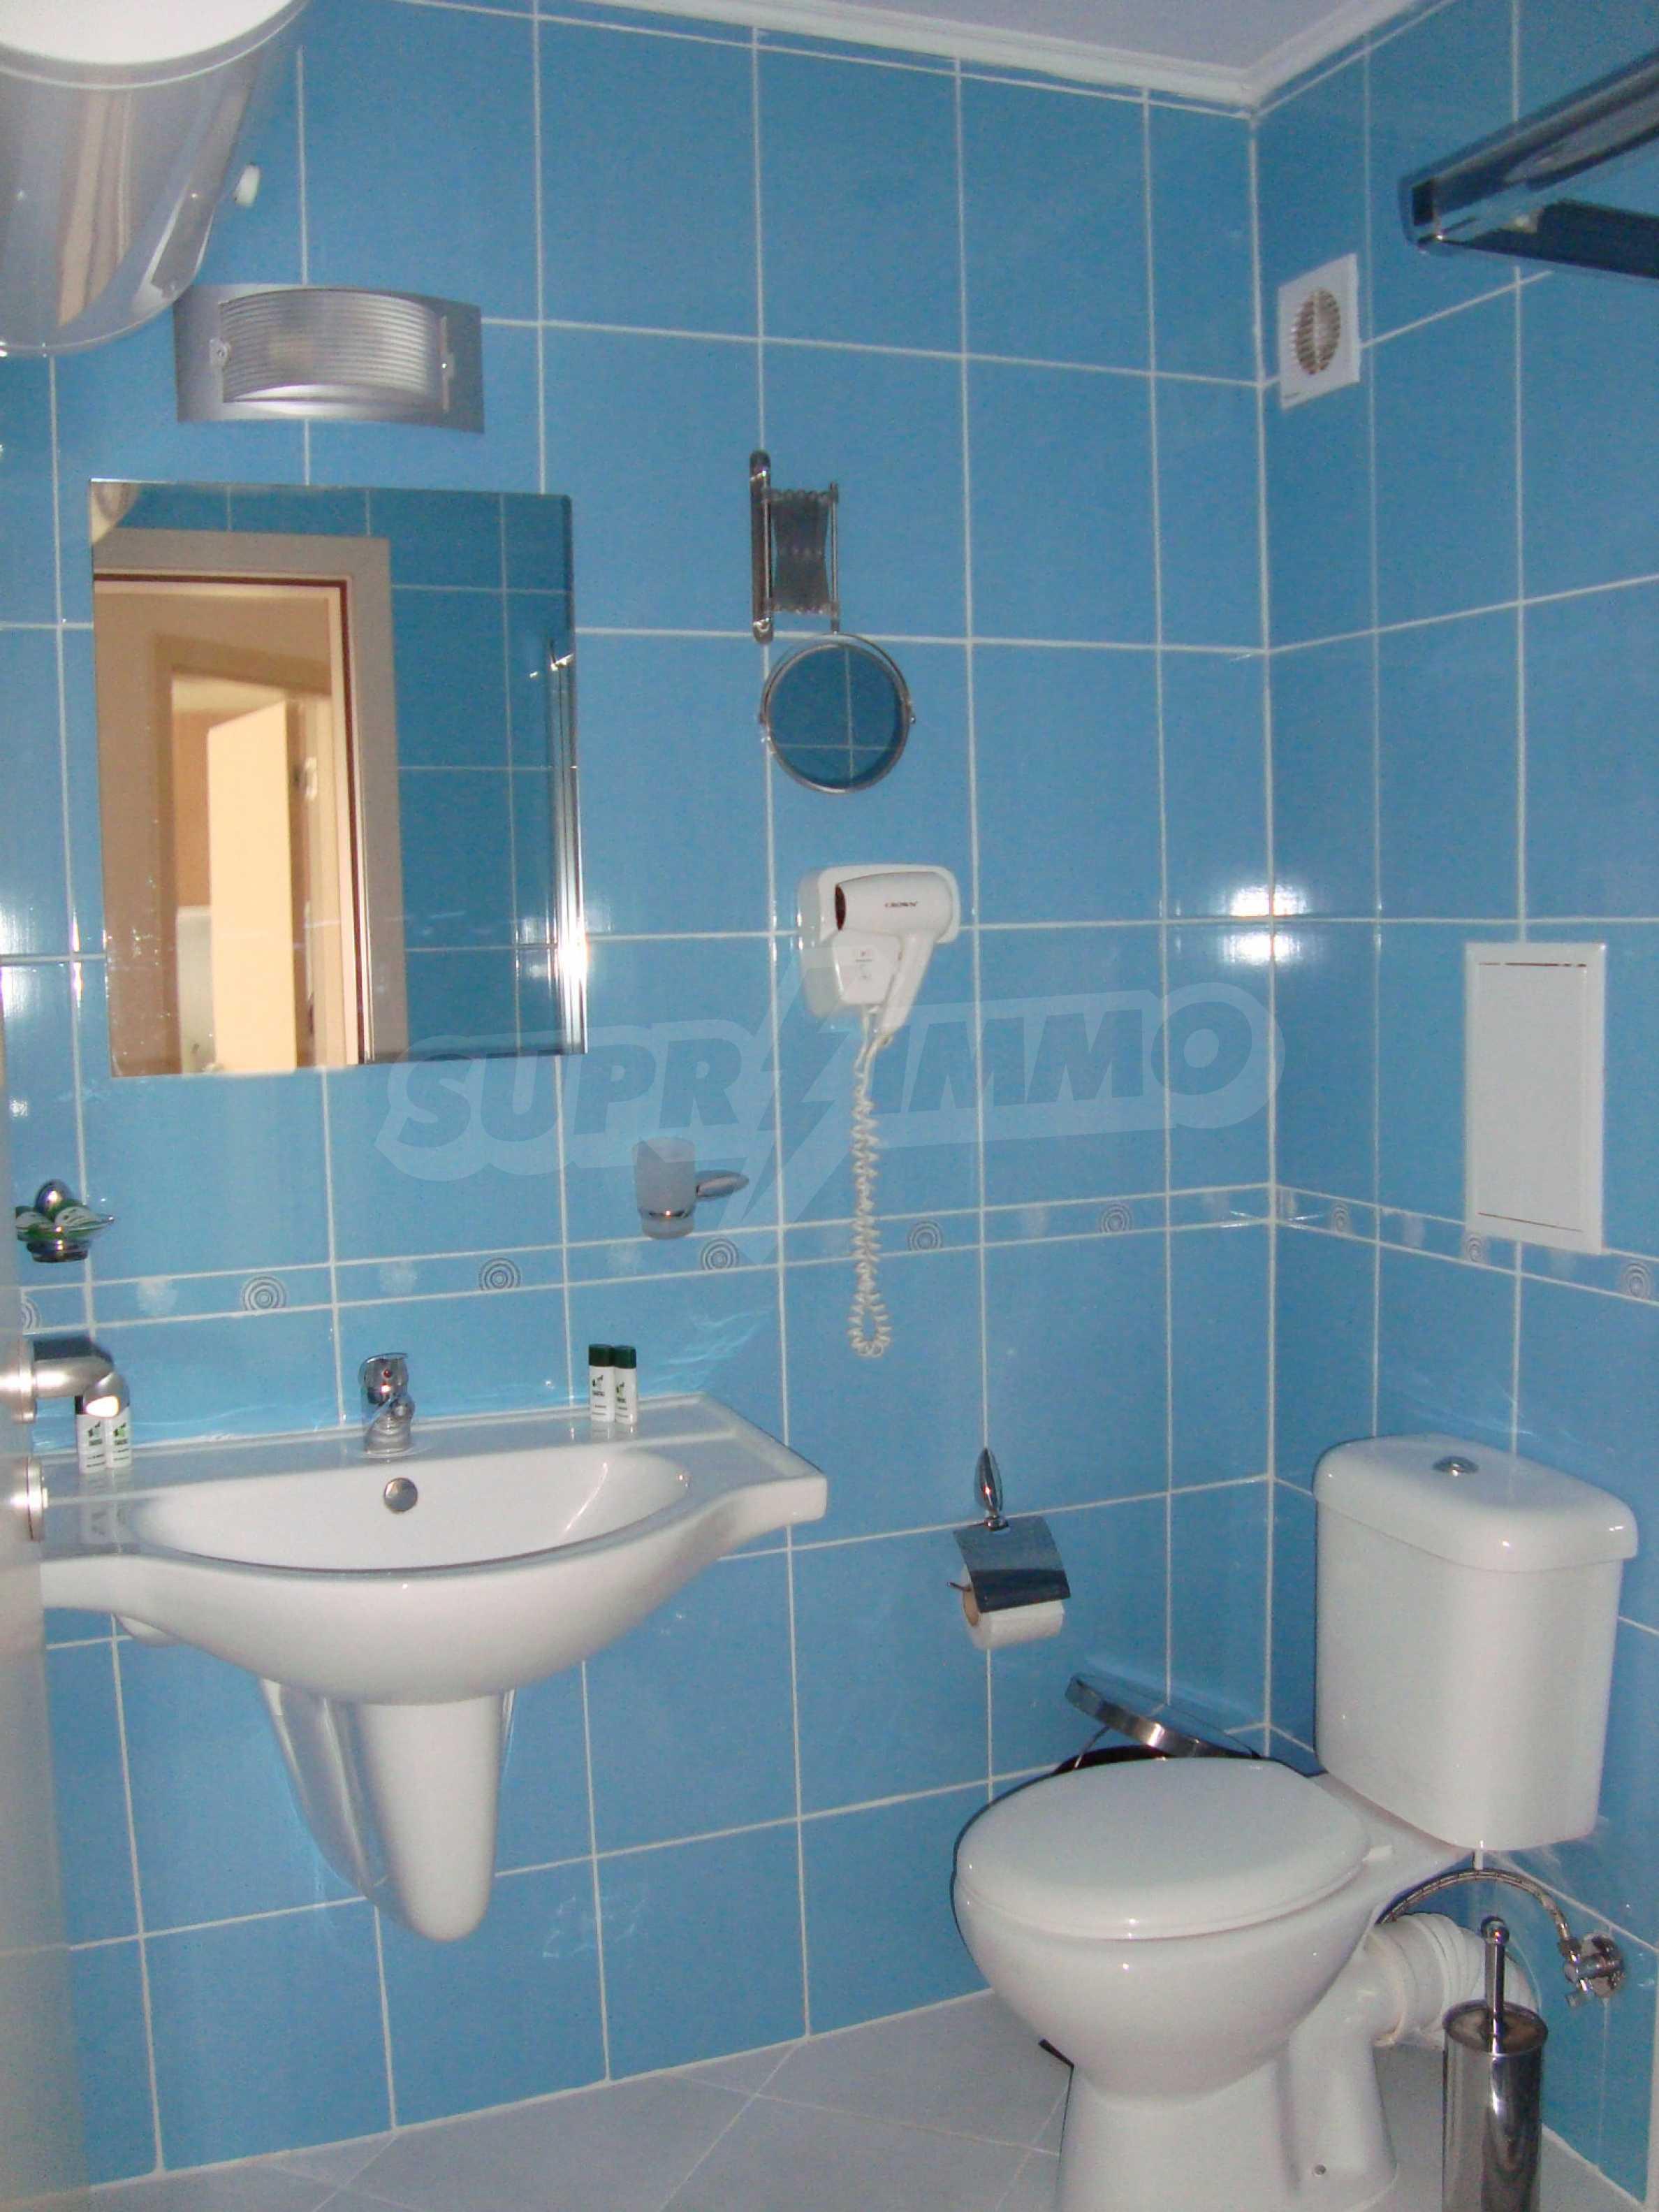 1-bedroom apartment in Emberli complex in Lozenets 5